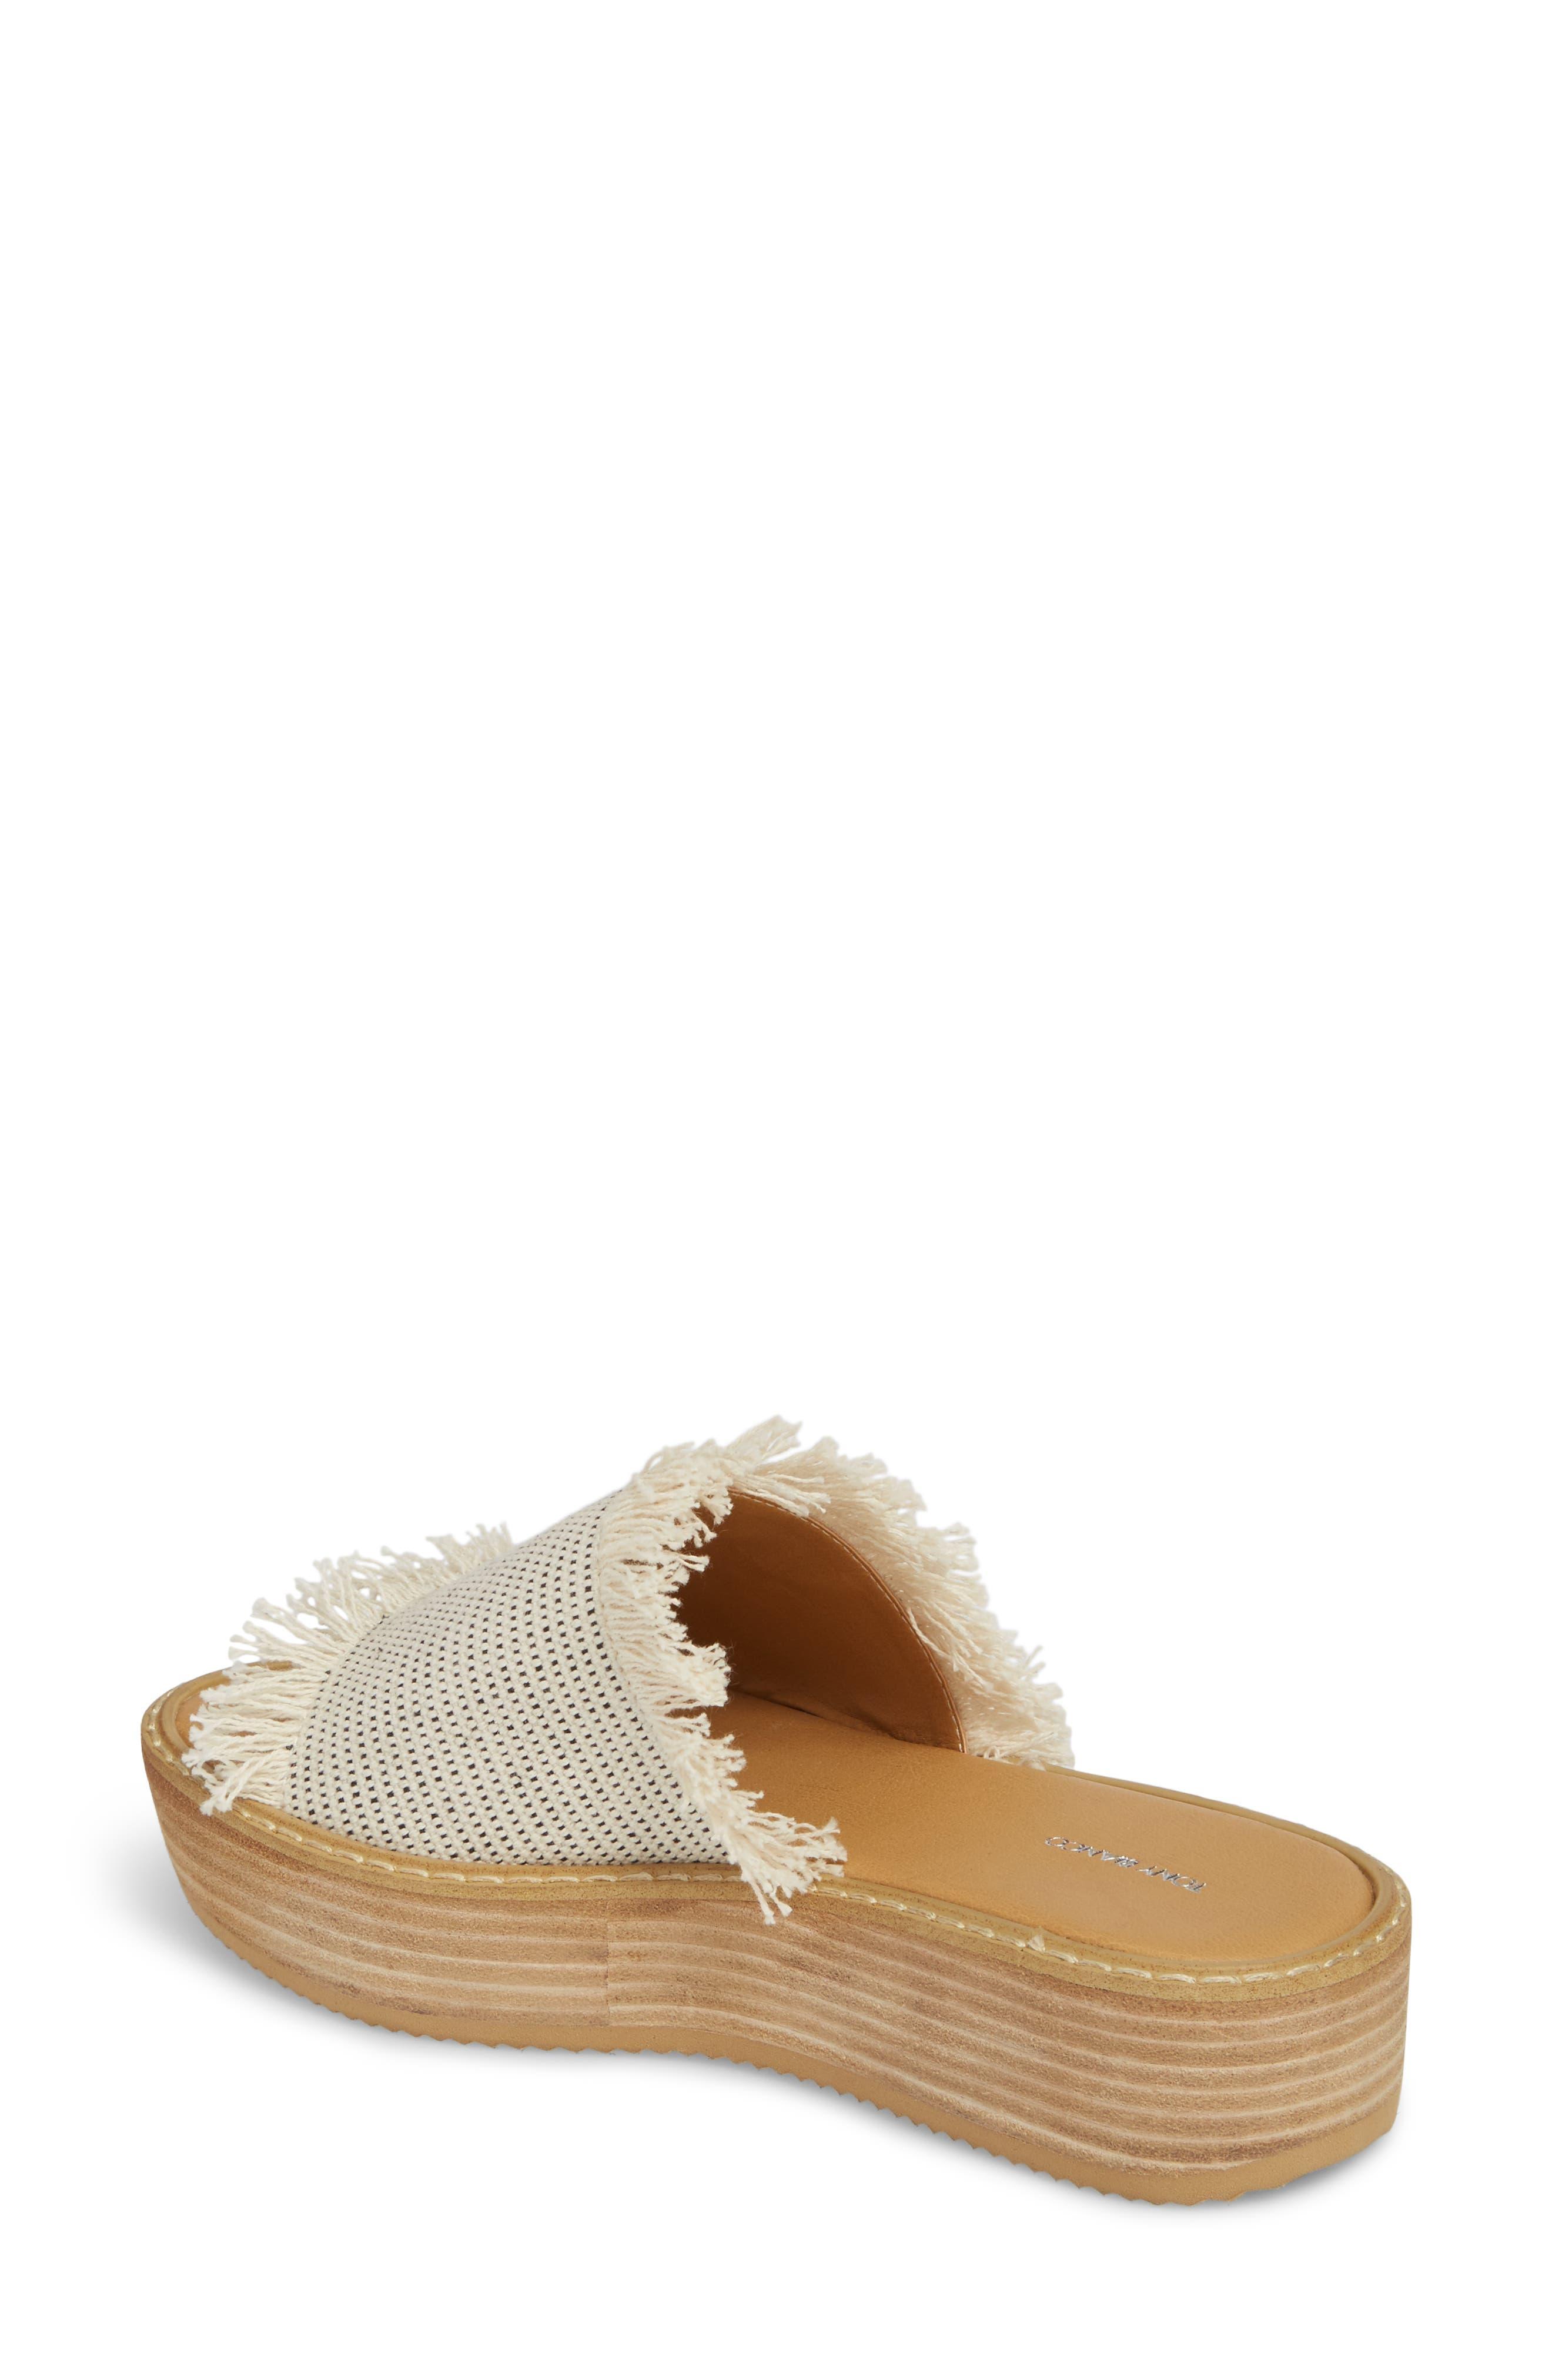 Ebony Platform Sandal,                             Alternate thumbnail 2, color,                             White/ Black Osaka Fabric